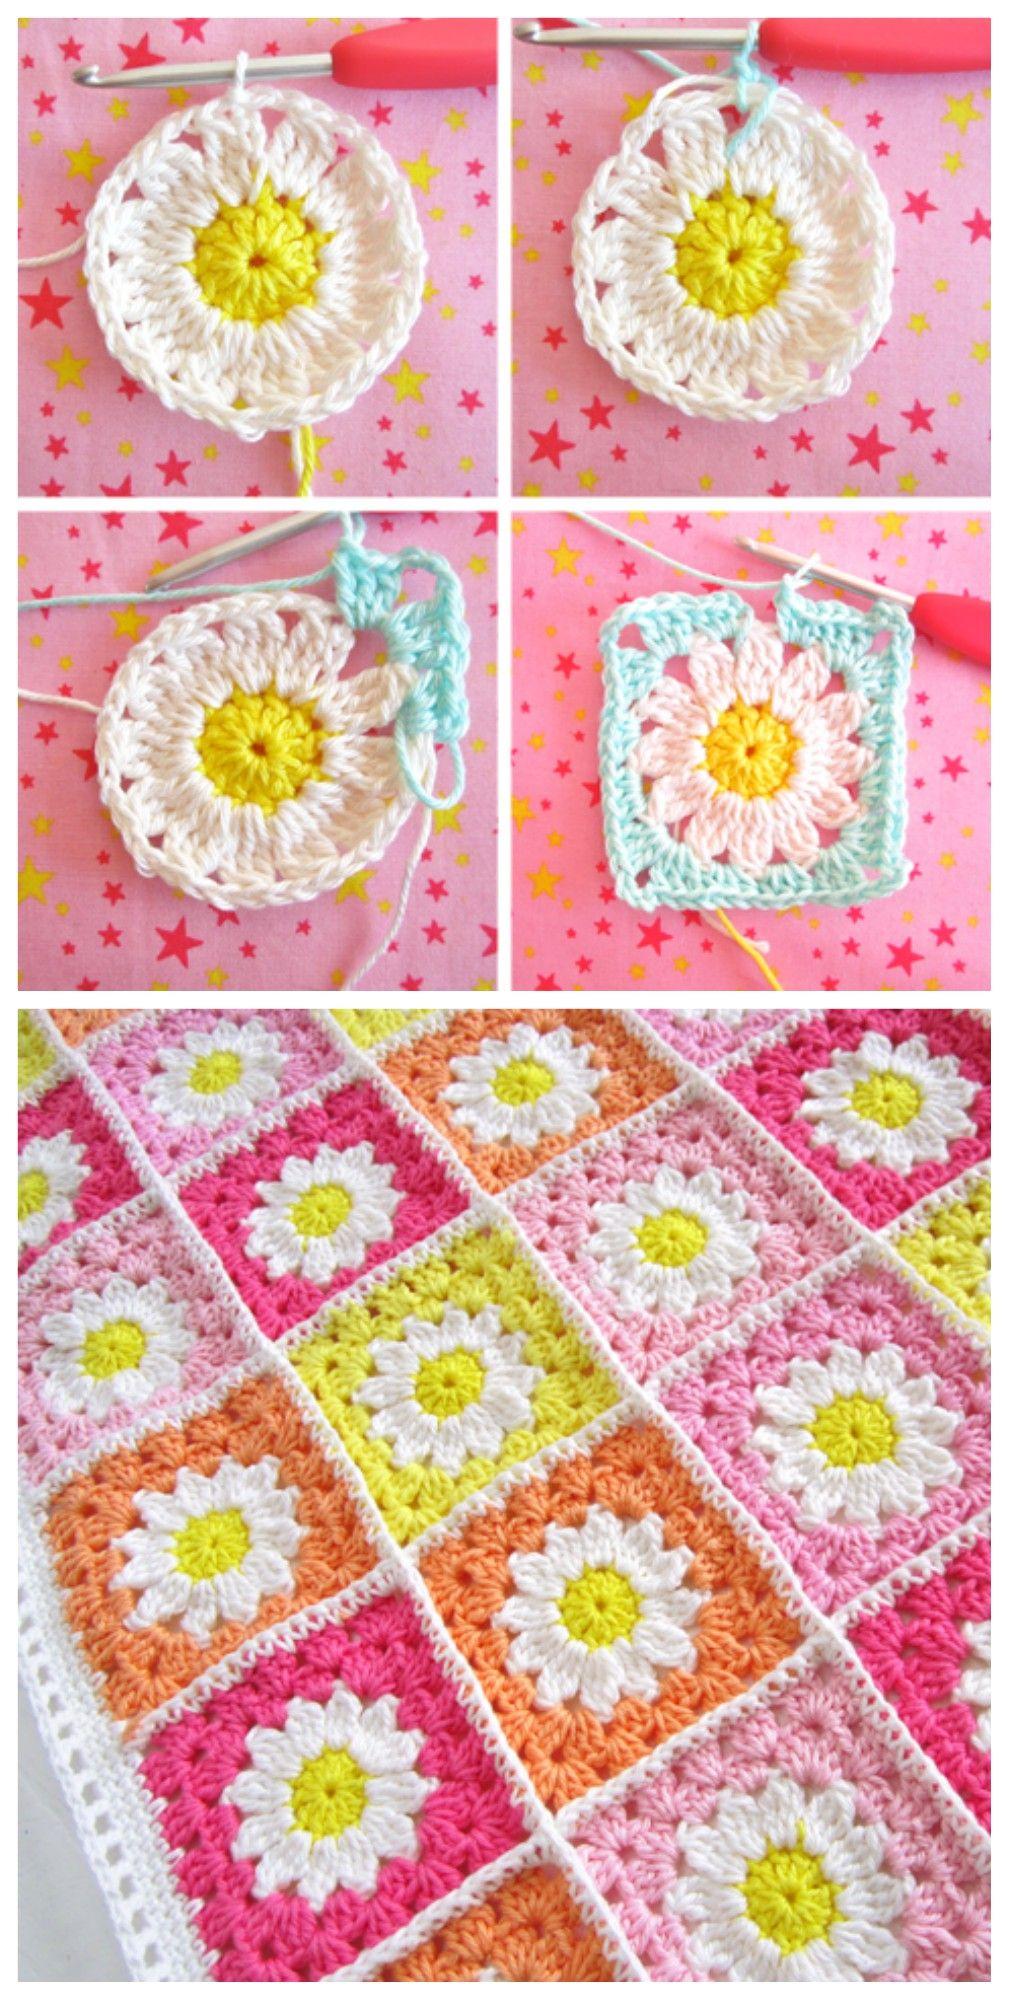 Crochet Daisy Granny Square Pattern Youtube Video